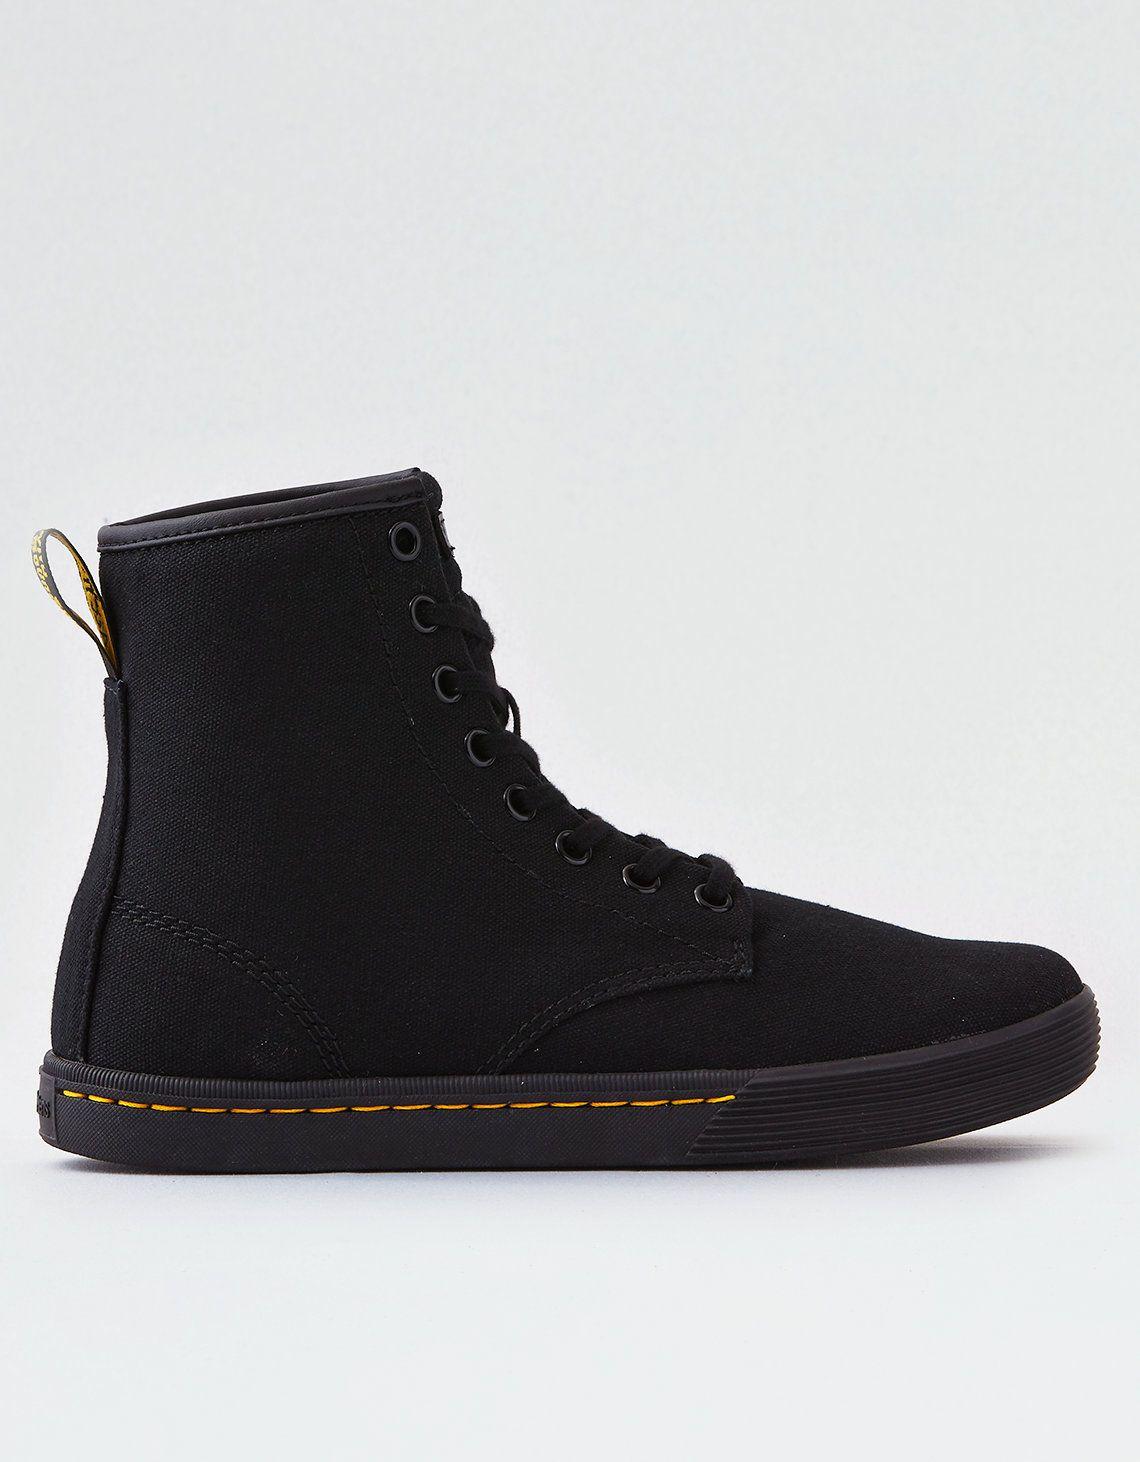 Boots, Dr martens boots